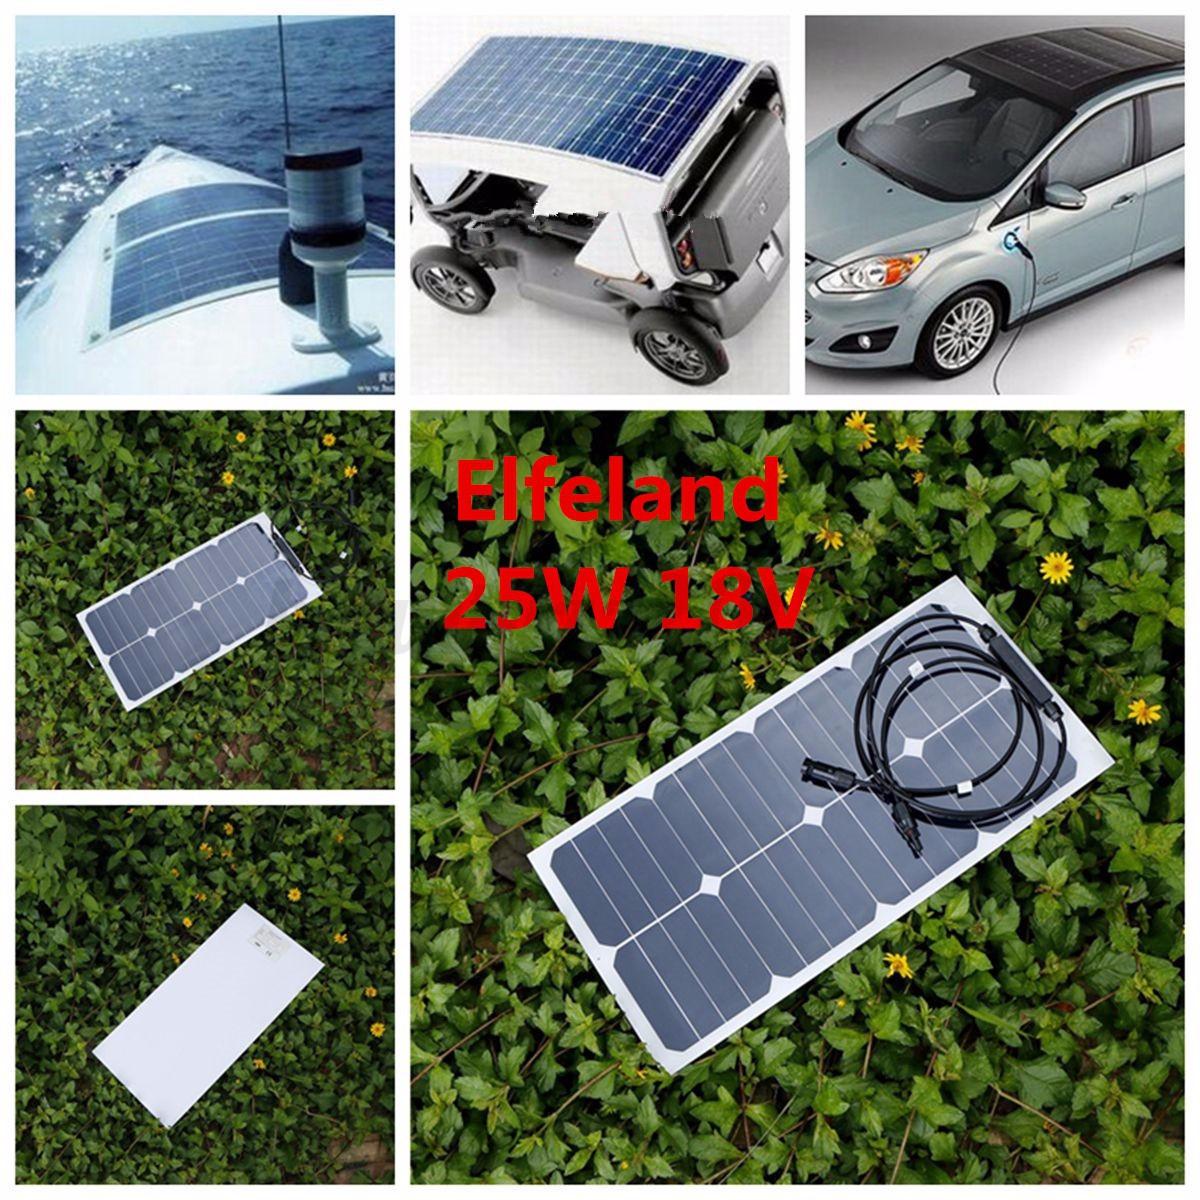 Elfeland 25w 18v Solar Panels Single Crystal Flexible